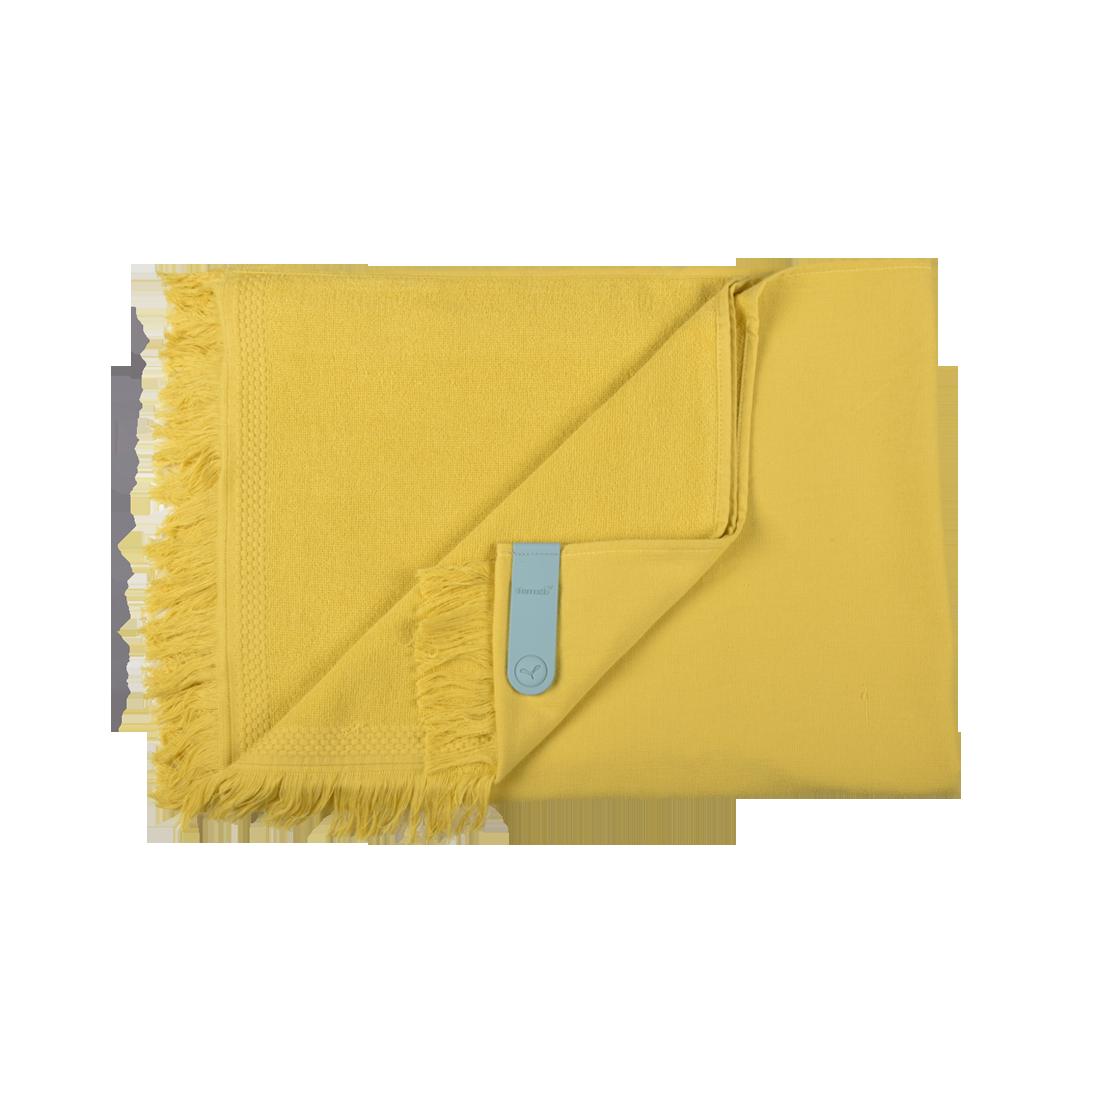 fouta, serviette de plage, fouta fermob, serviette fermob, fouta jaune